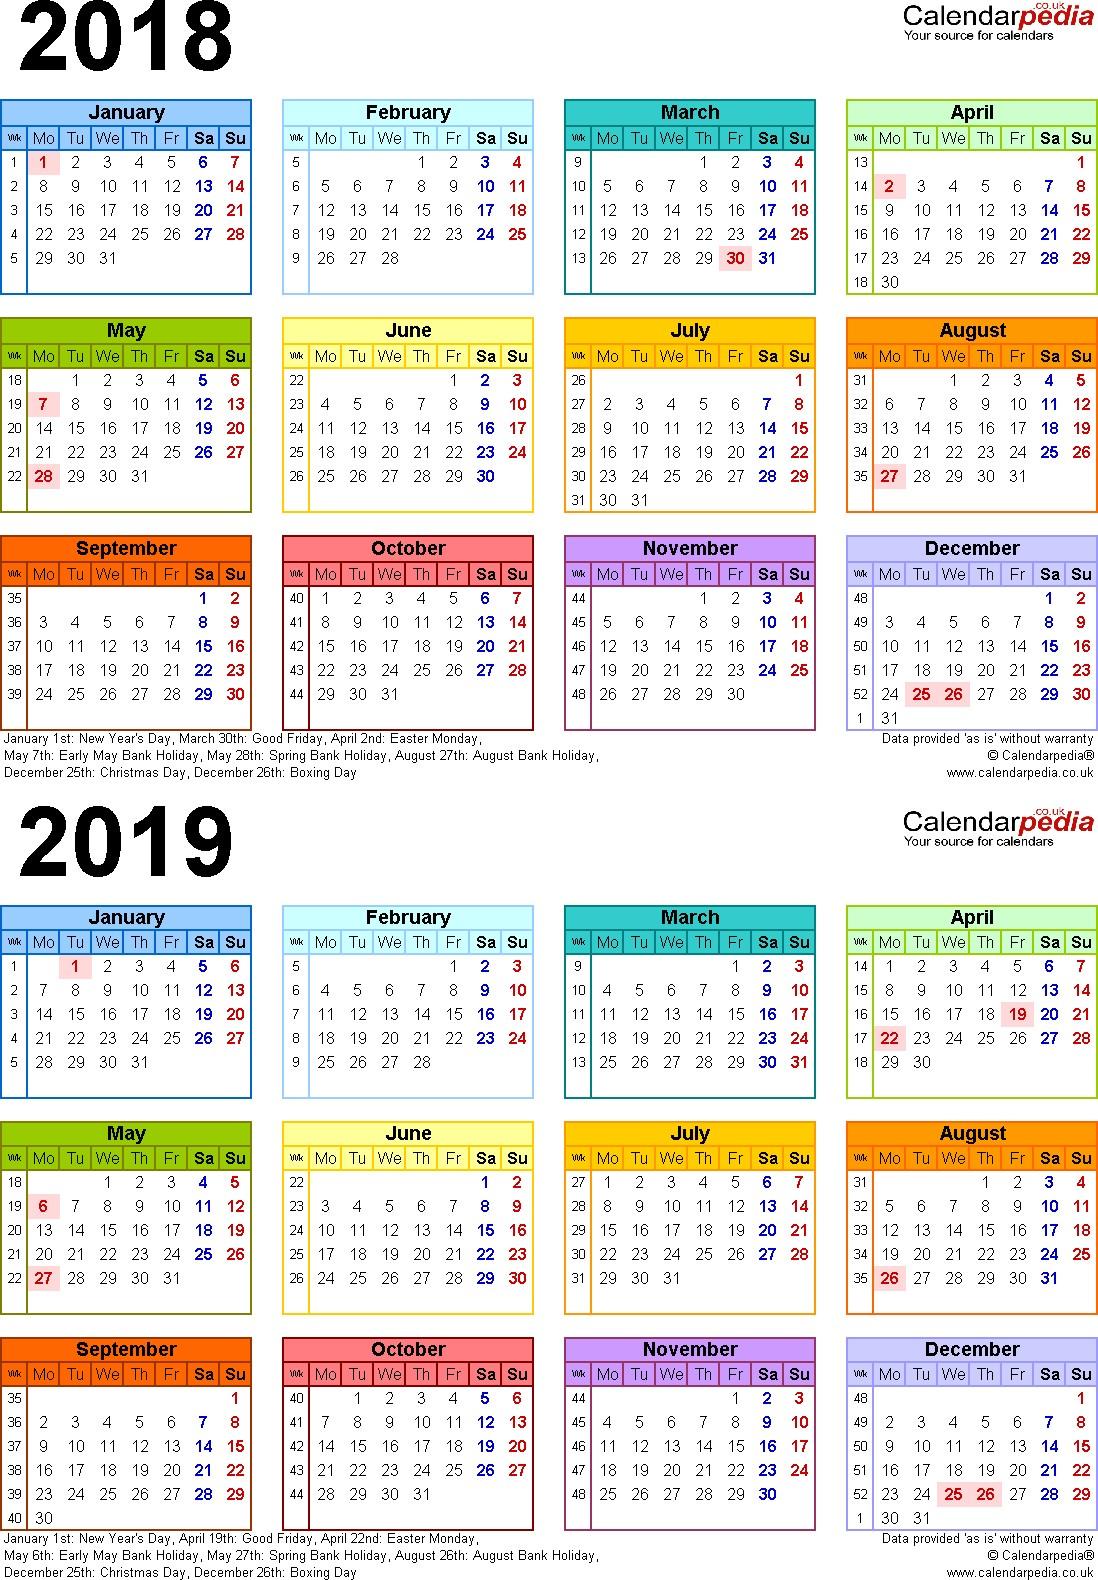 2019 Calendar Printable Uk 2019 Calendar Canada